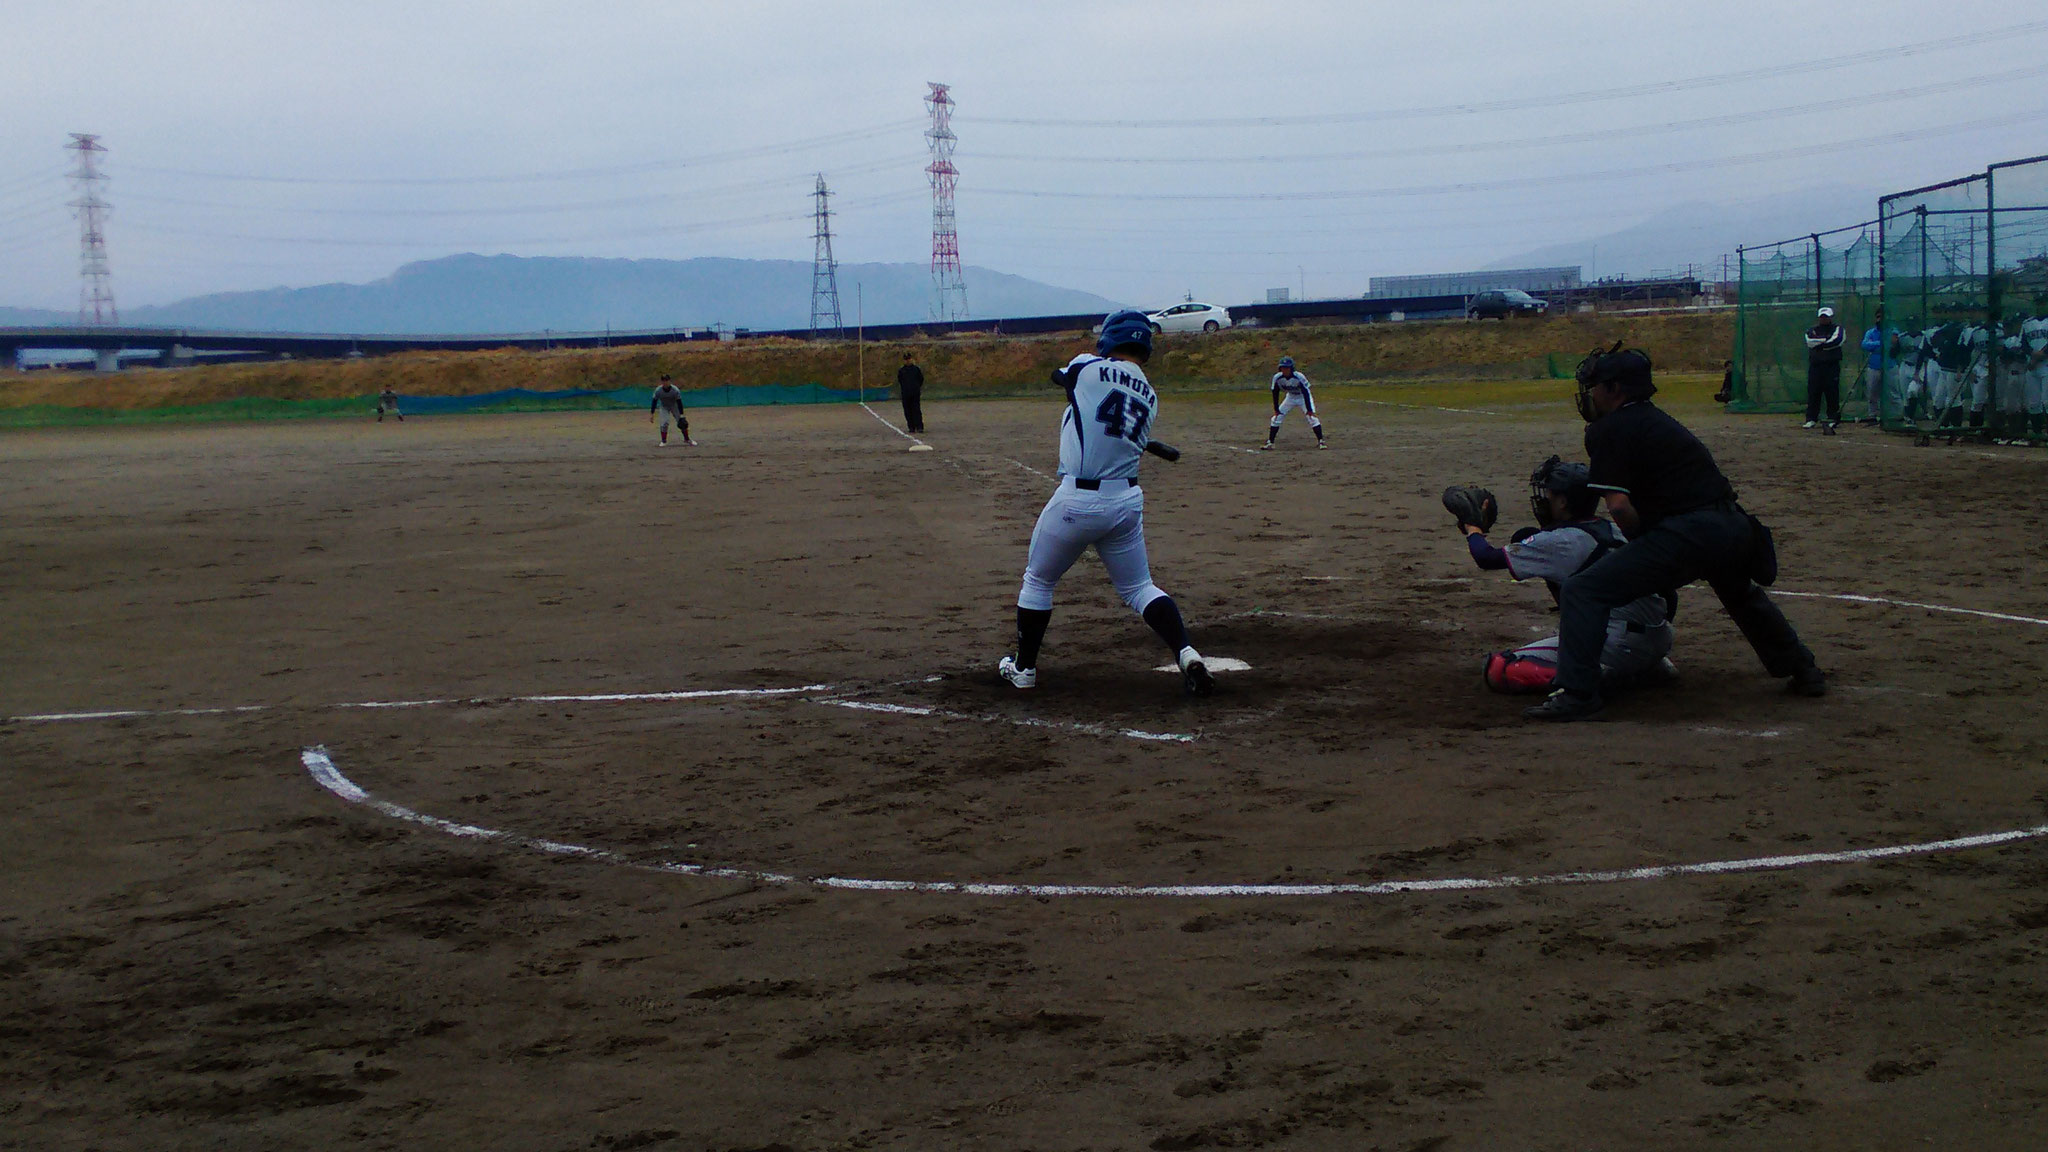 47 Kimura Masaya